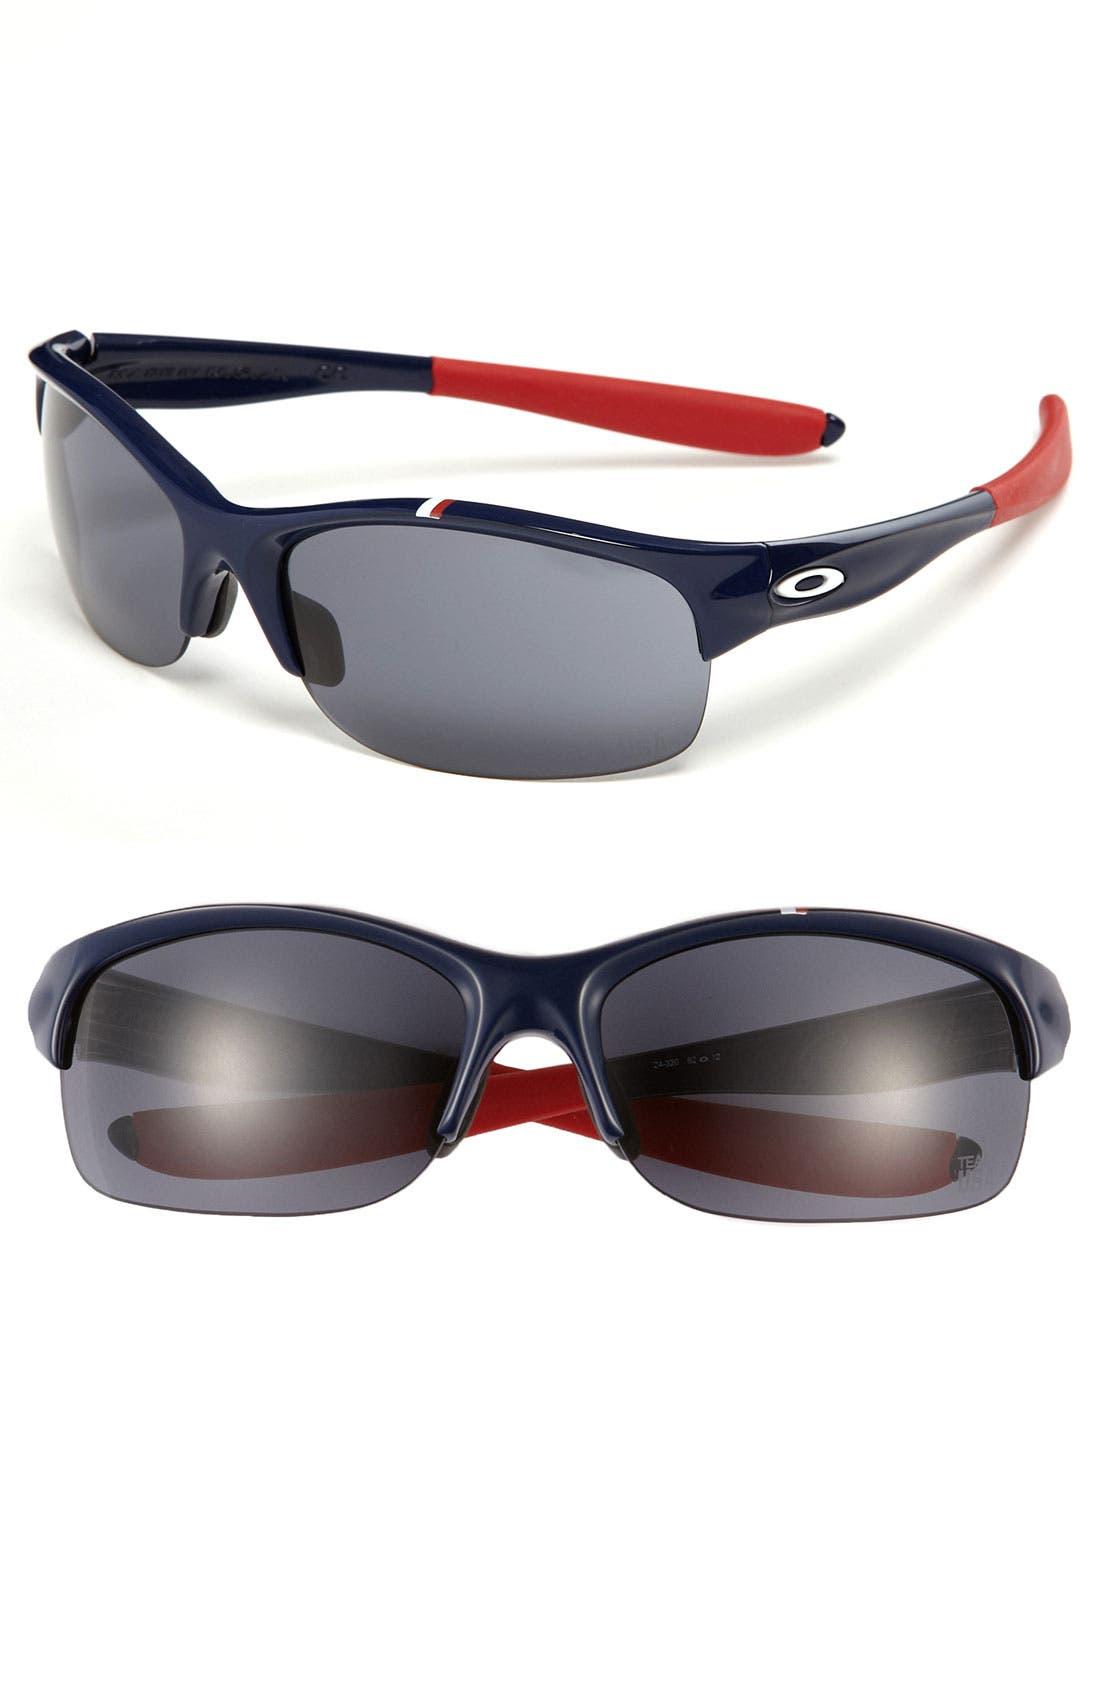 Alternate Image 1 Selected - Oakley 'Commit™ - Team USA' Sunglasses